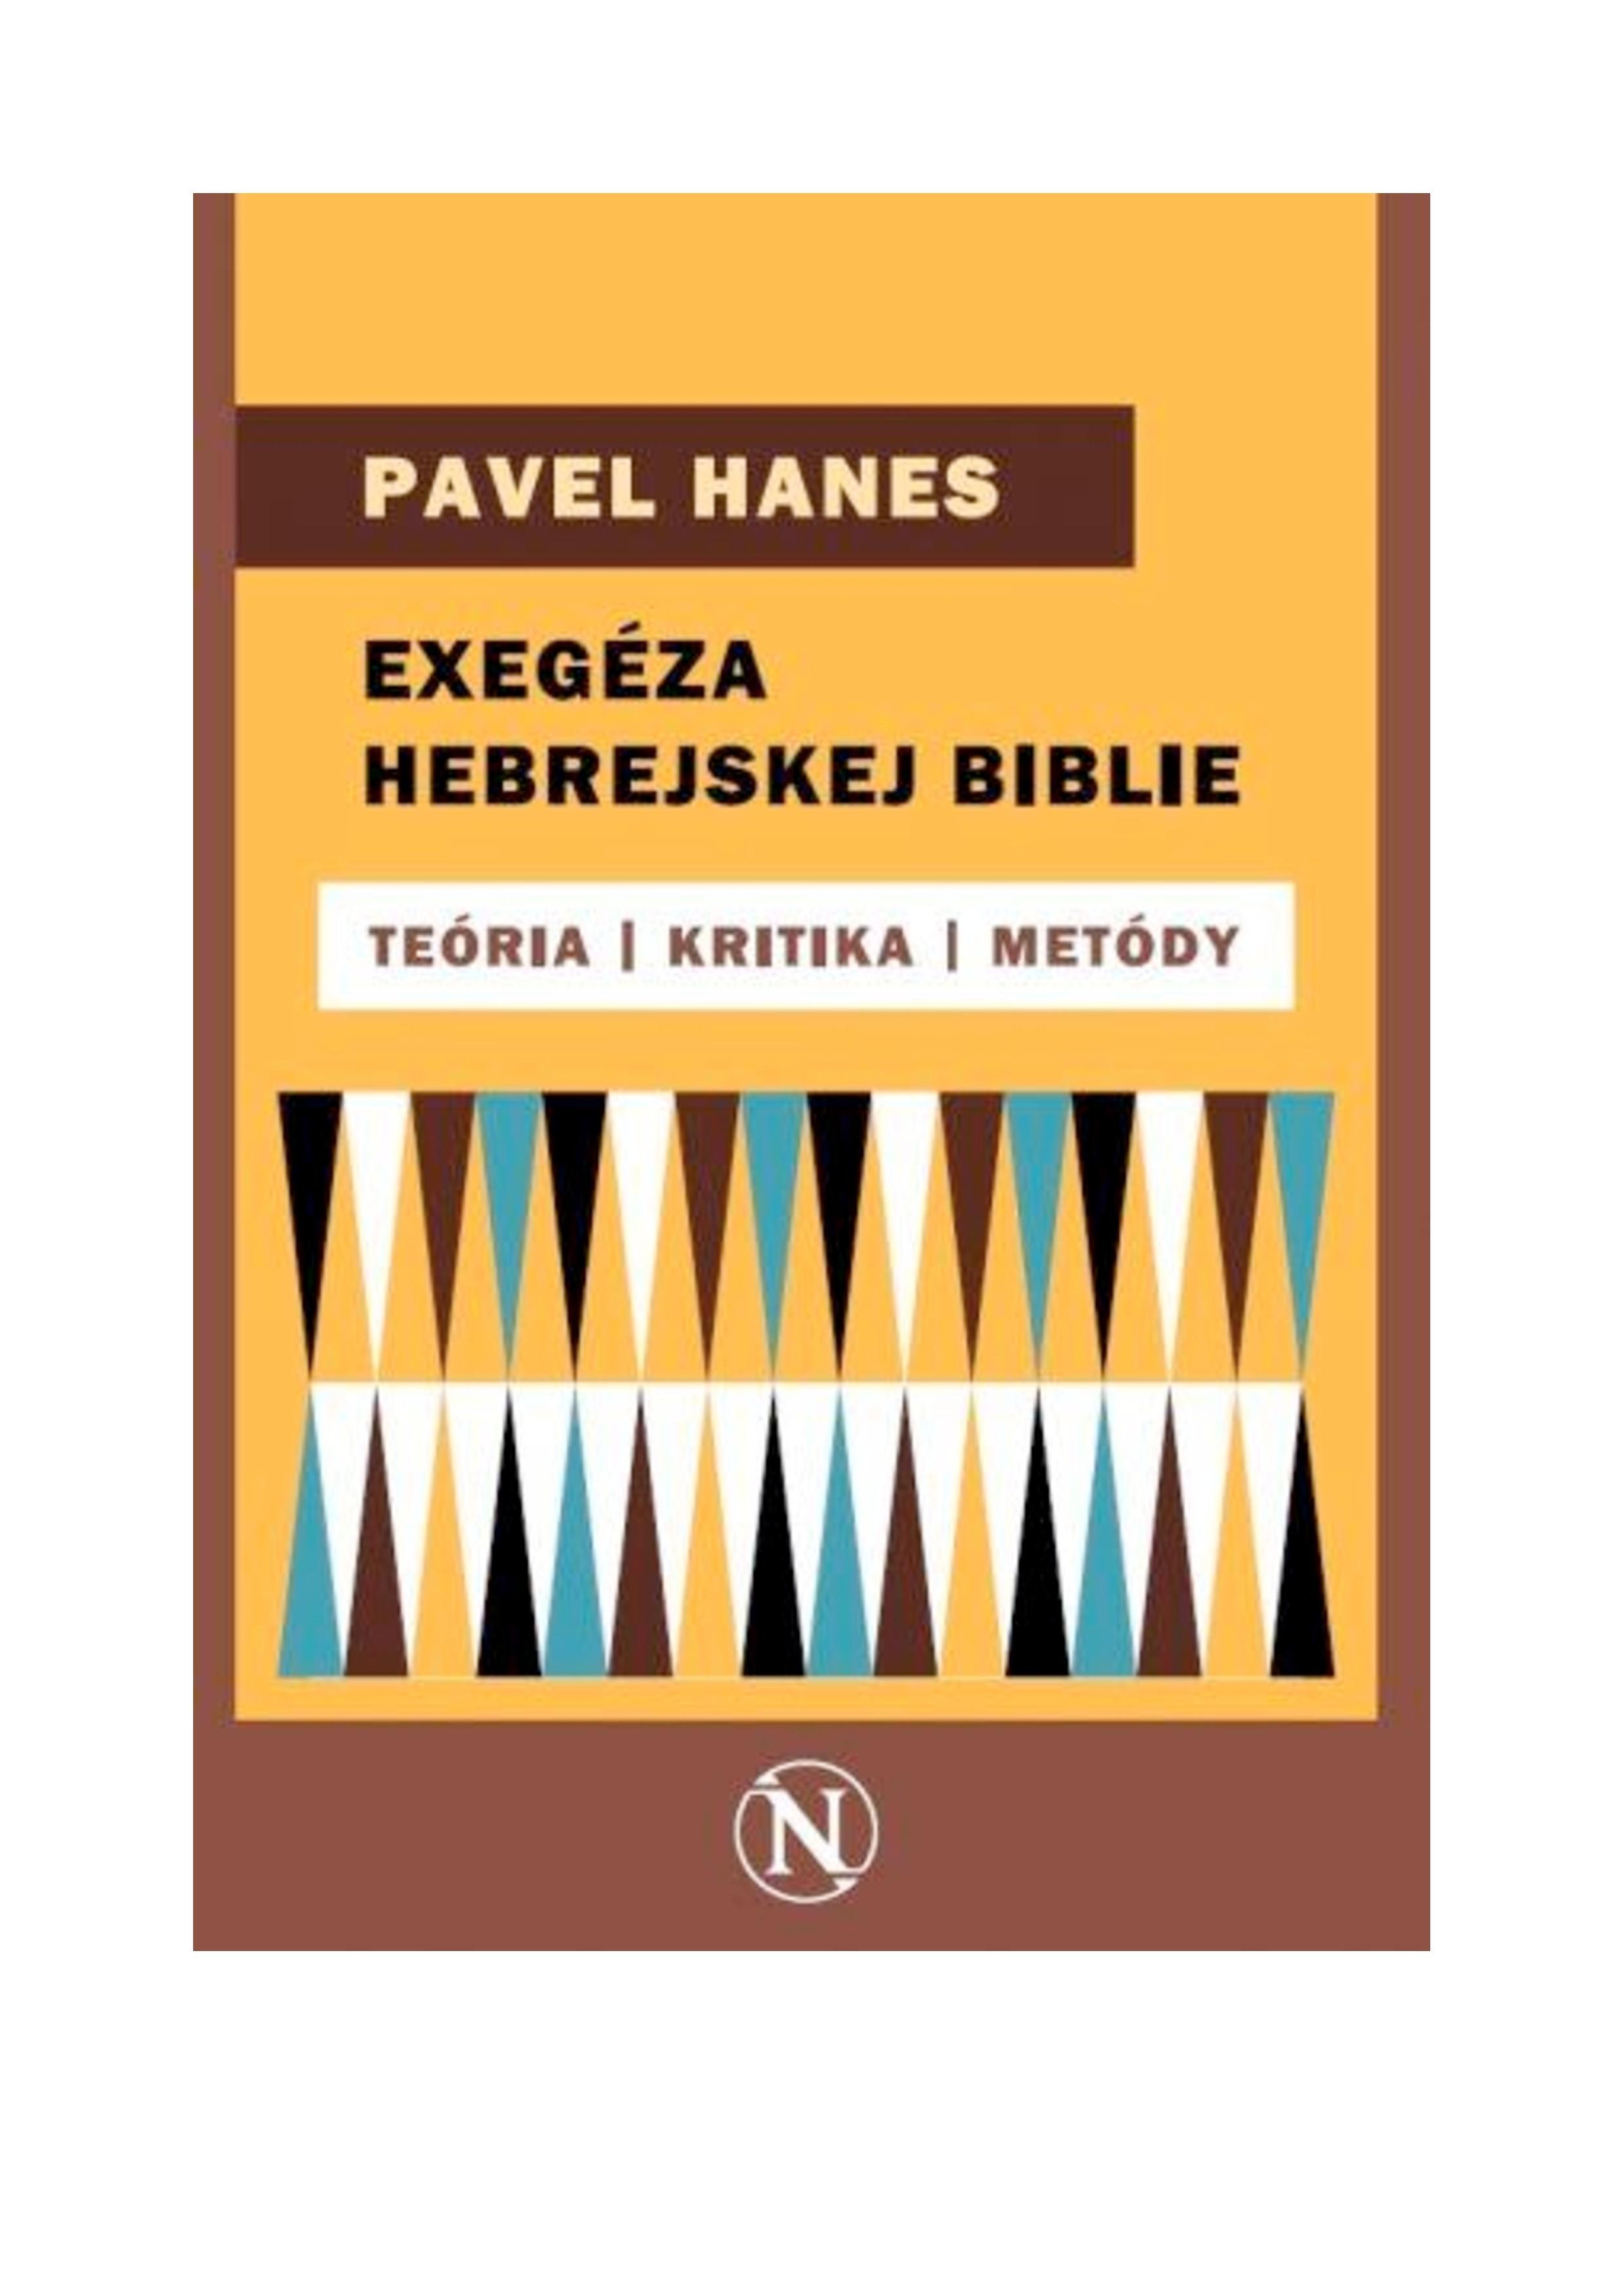 Exegéza hebrejskej Biblie – teória, kritika, metódy